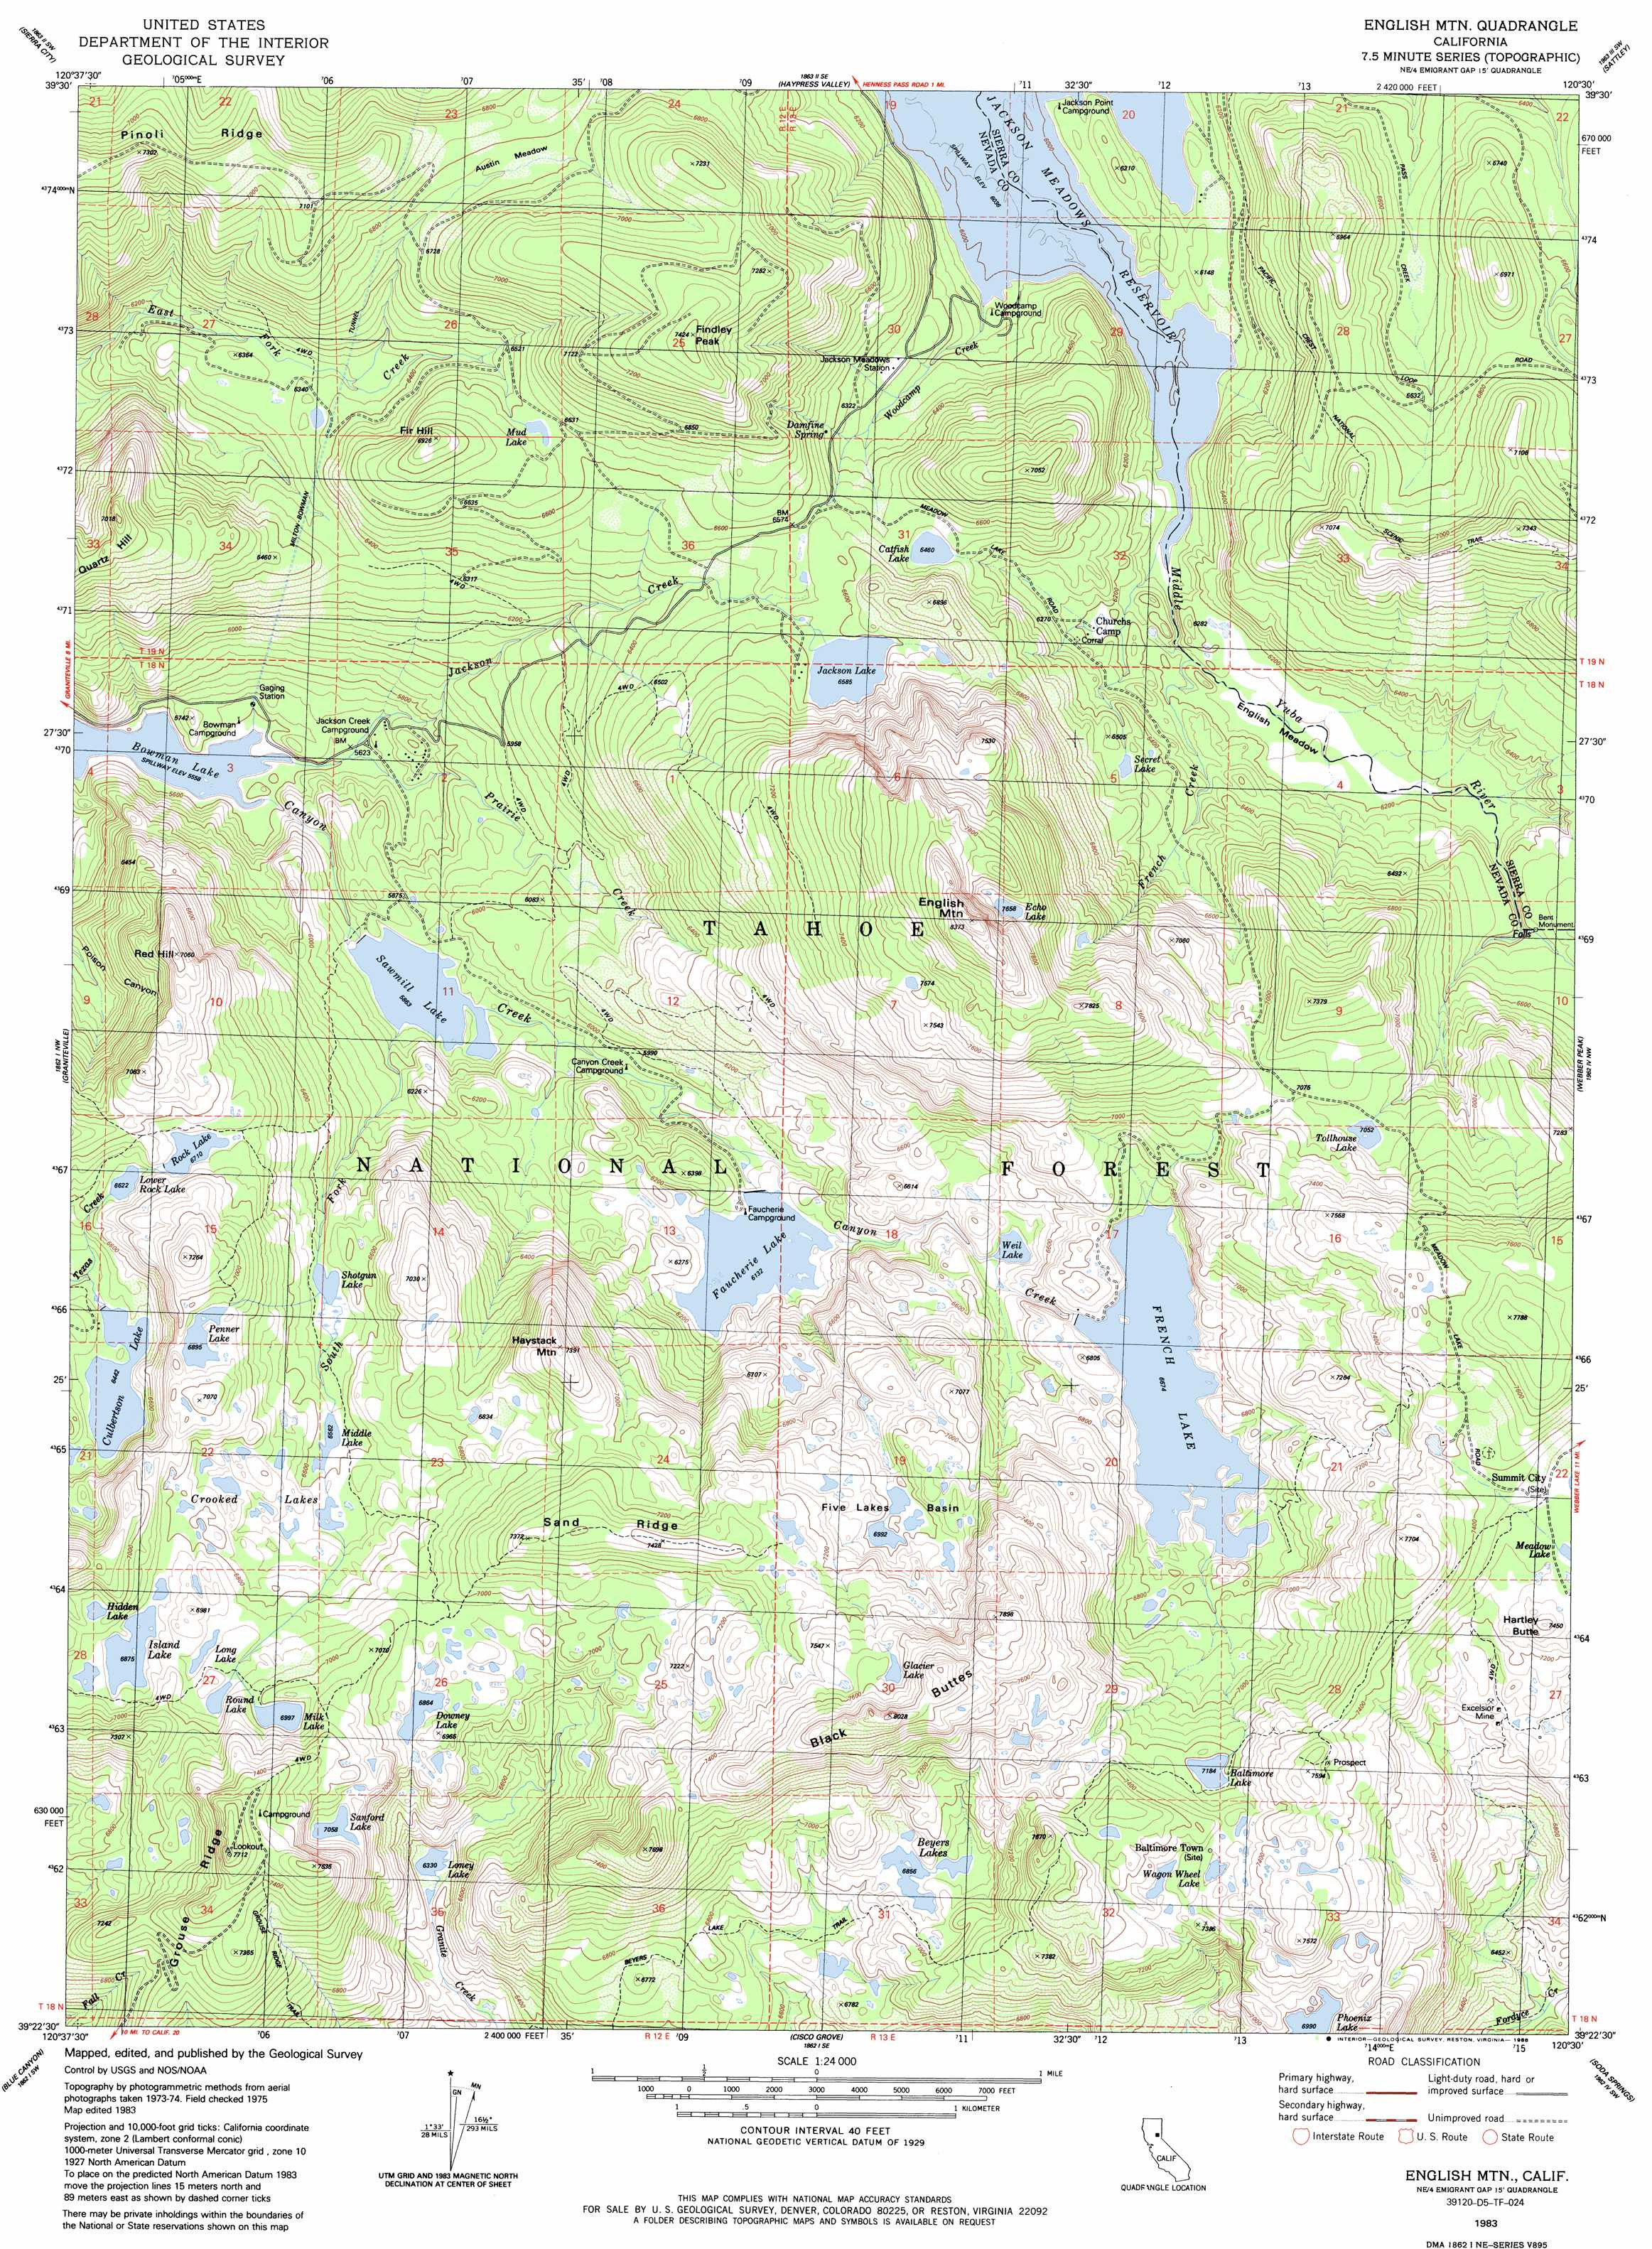 Physical Map Of California With Mountains Free Printable English - Free Printable Topo Maps